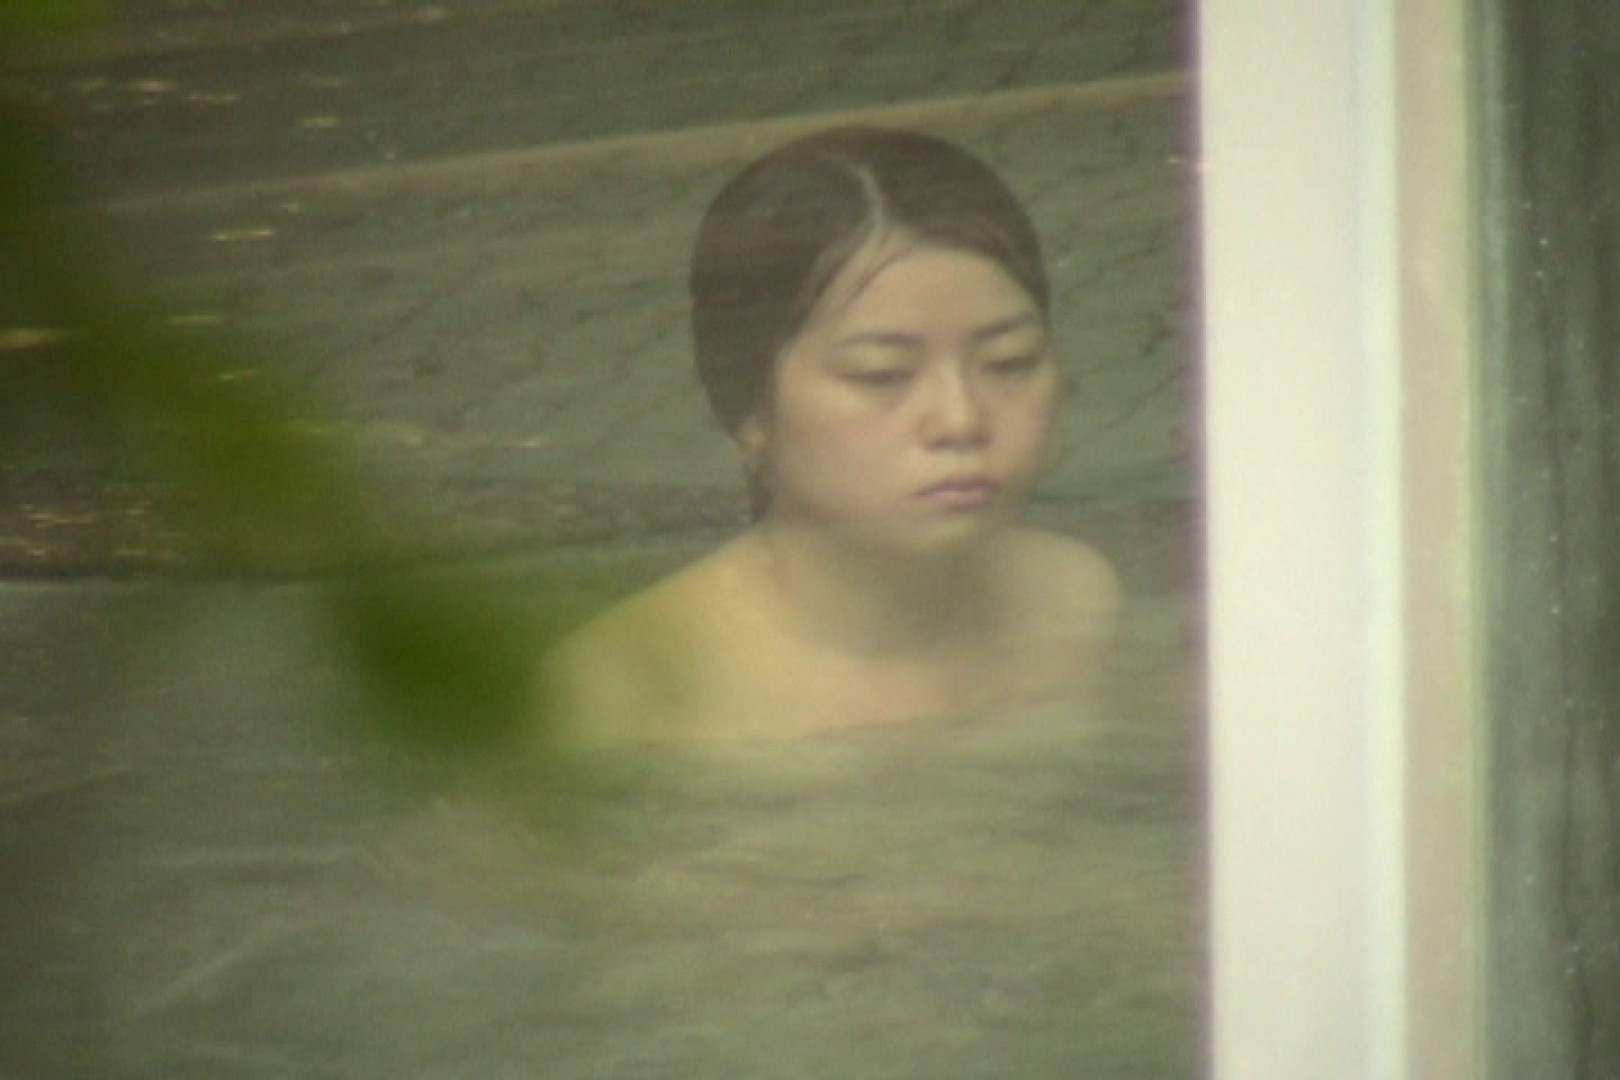 Aquaな露天風呂Vol.456 盗撮 | HなOL  102pic 68